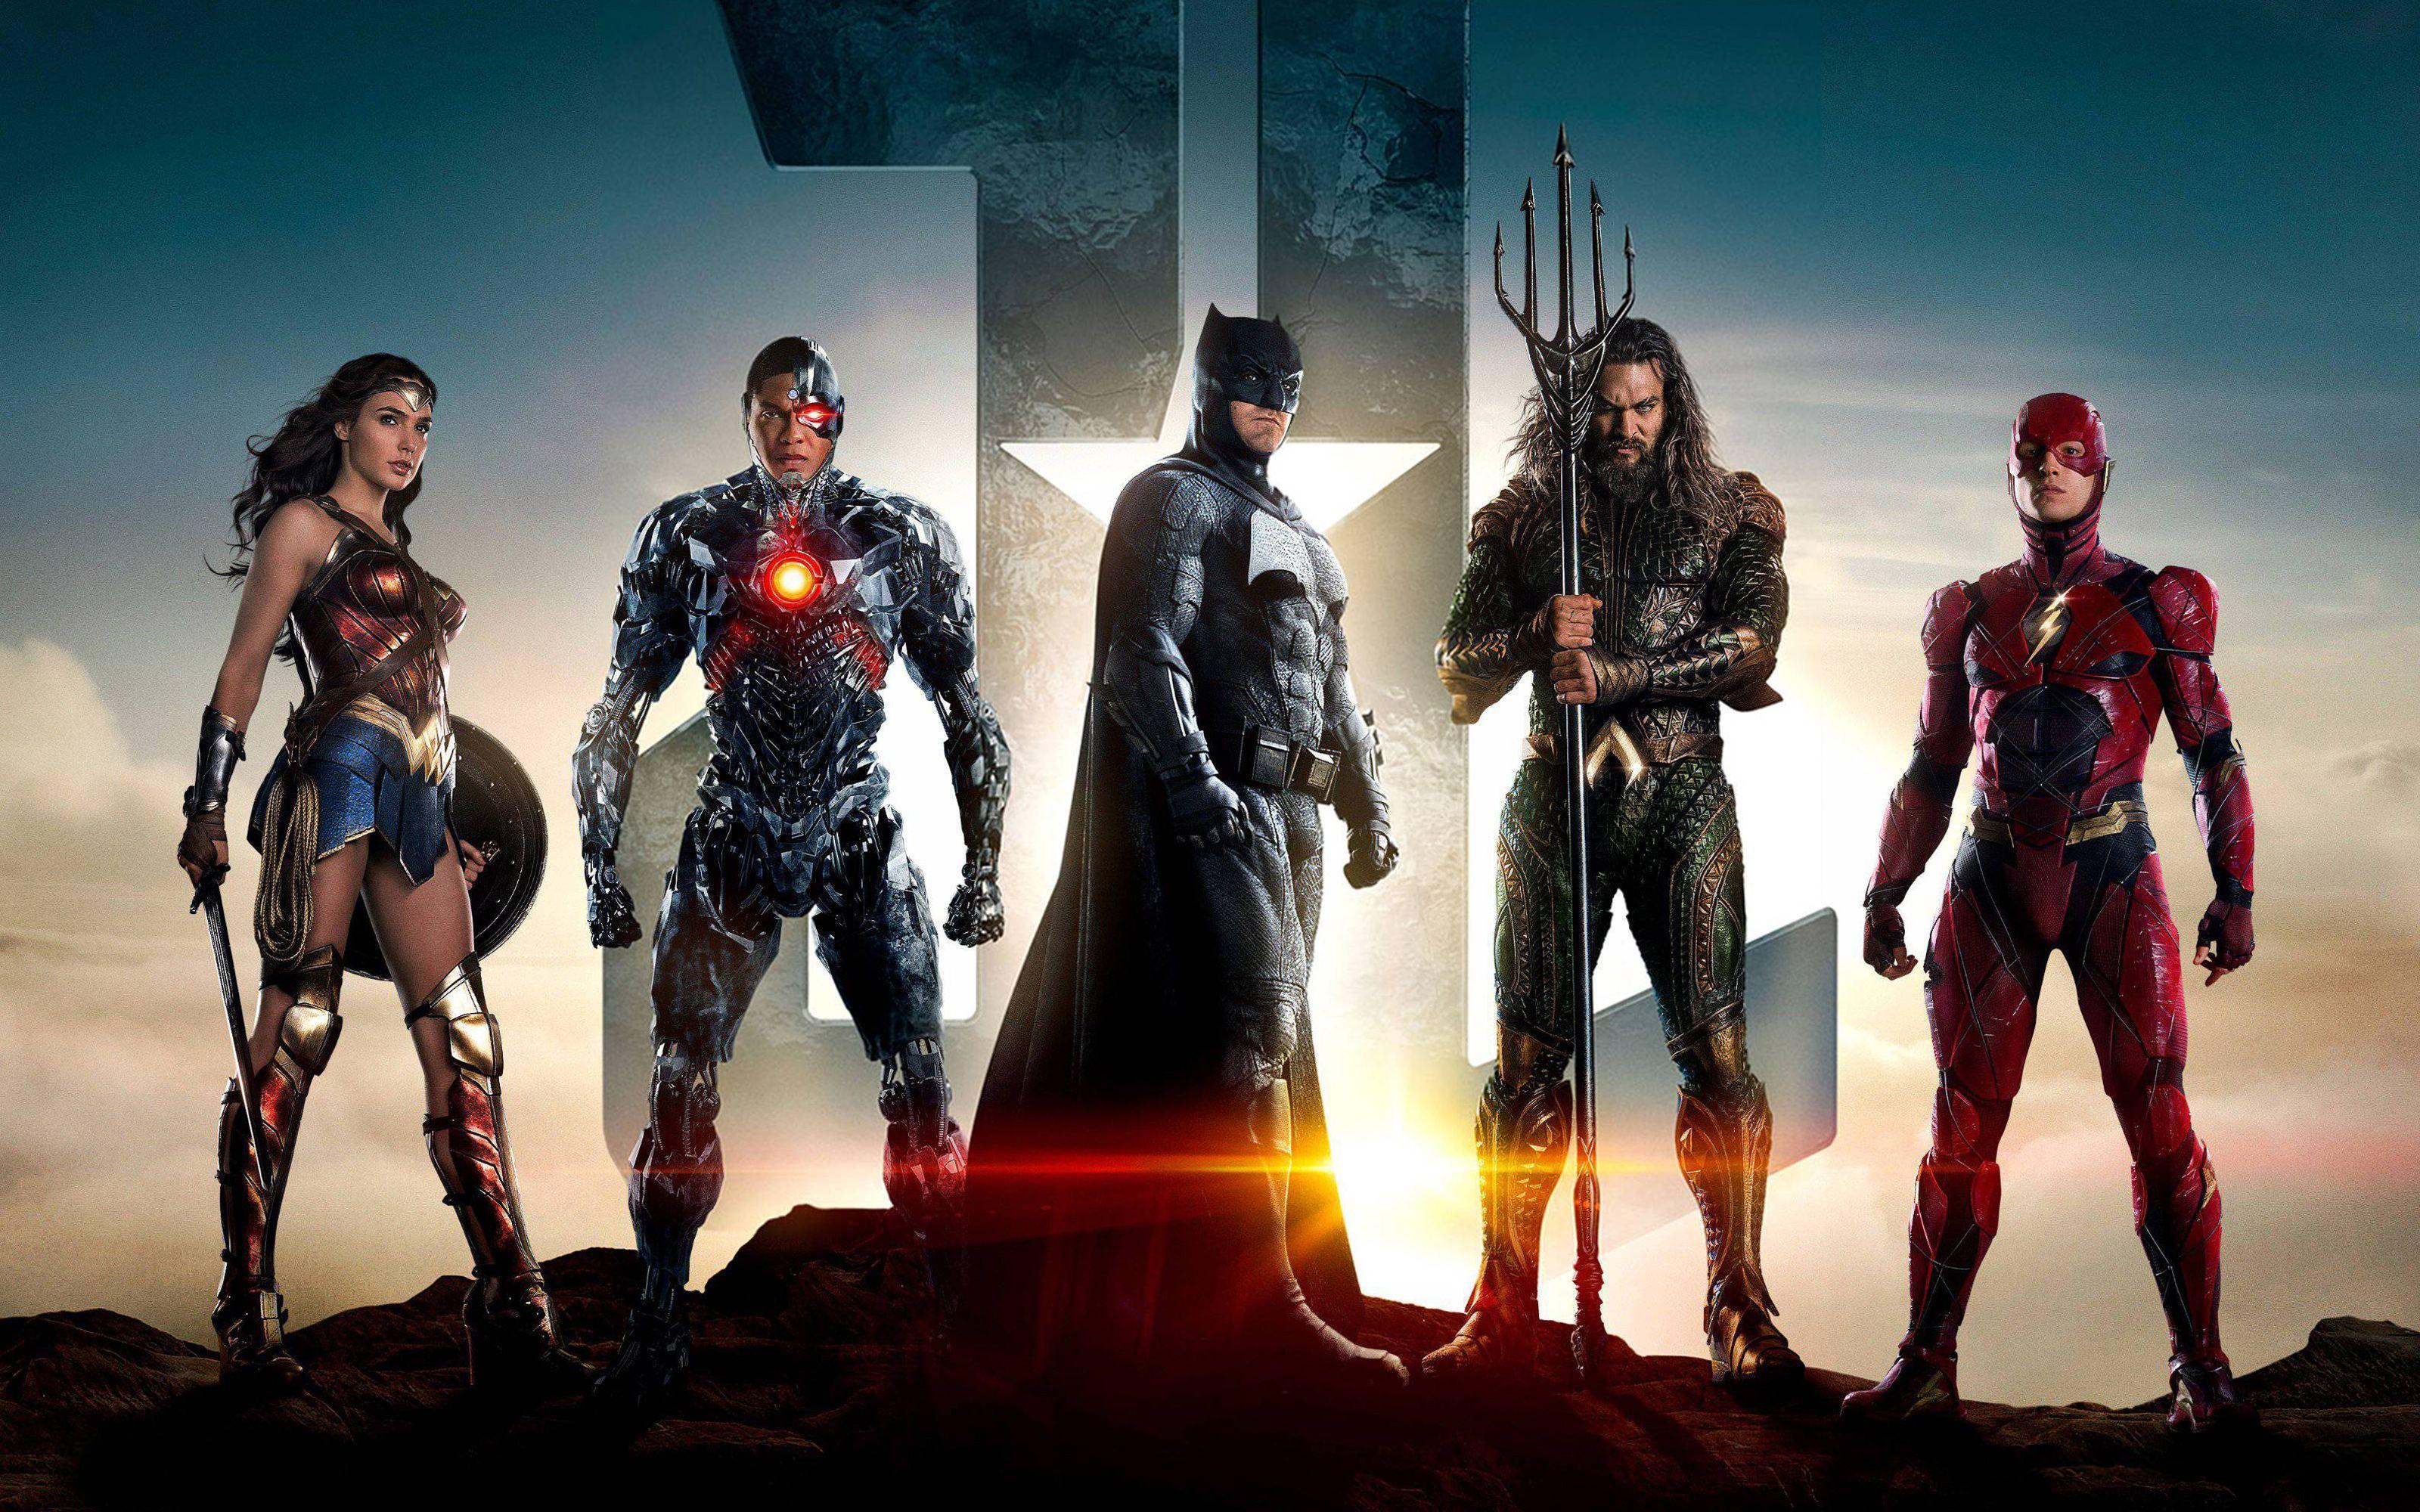 Hình nền 3200x2000 Justice League Superheroes